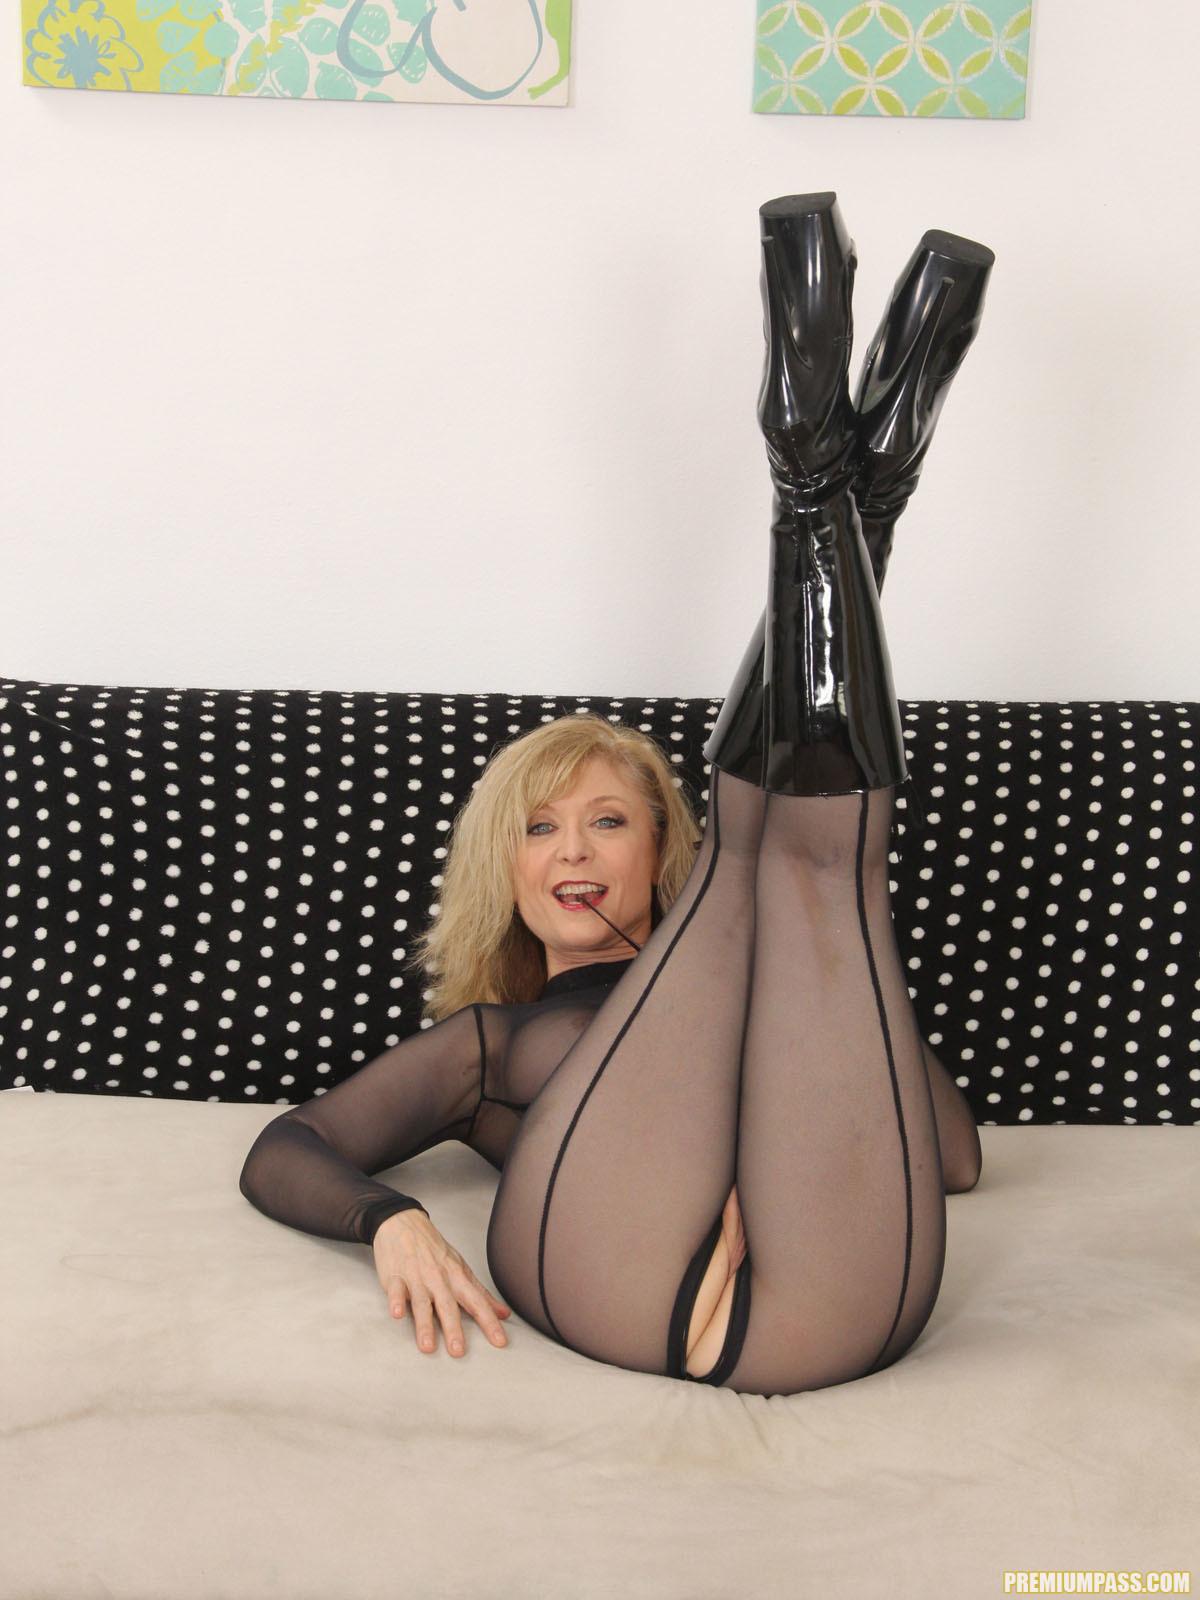 Nina Hartley - Full Body Pantyhose and Face Sitting 56667